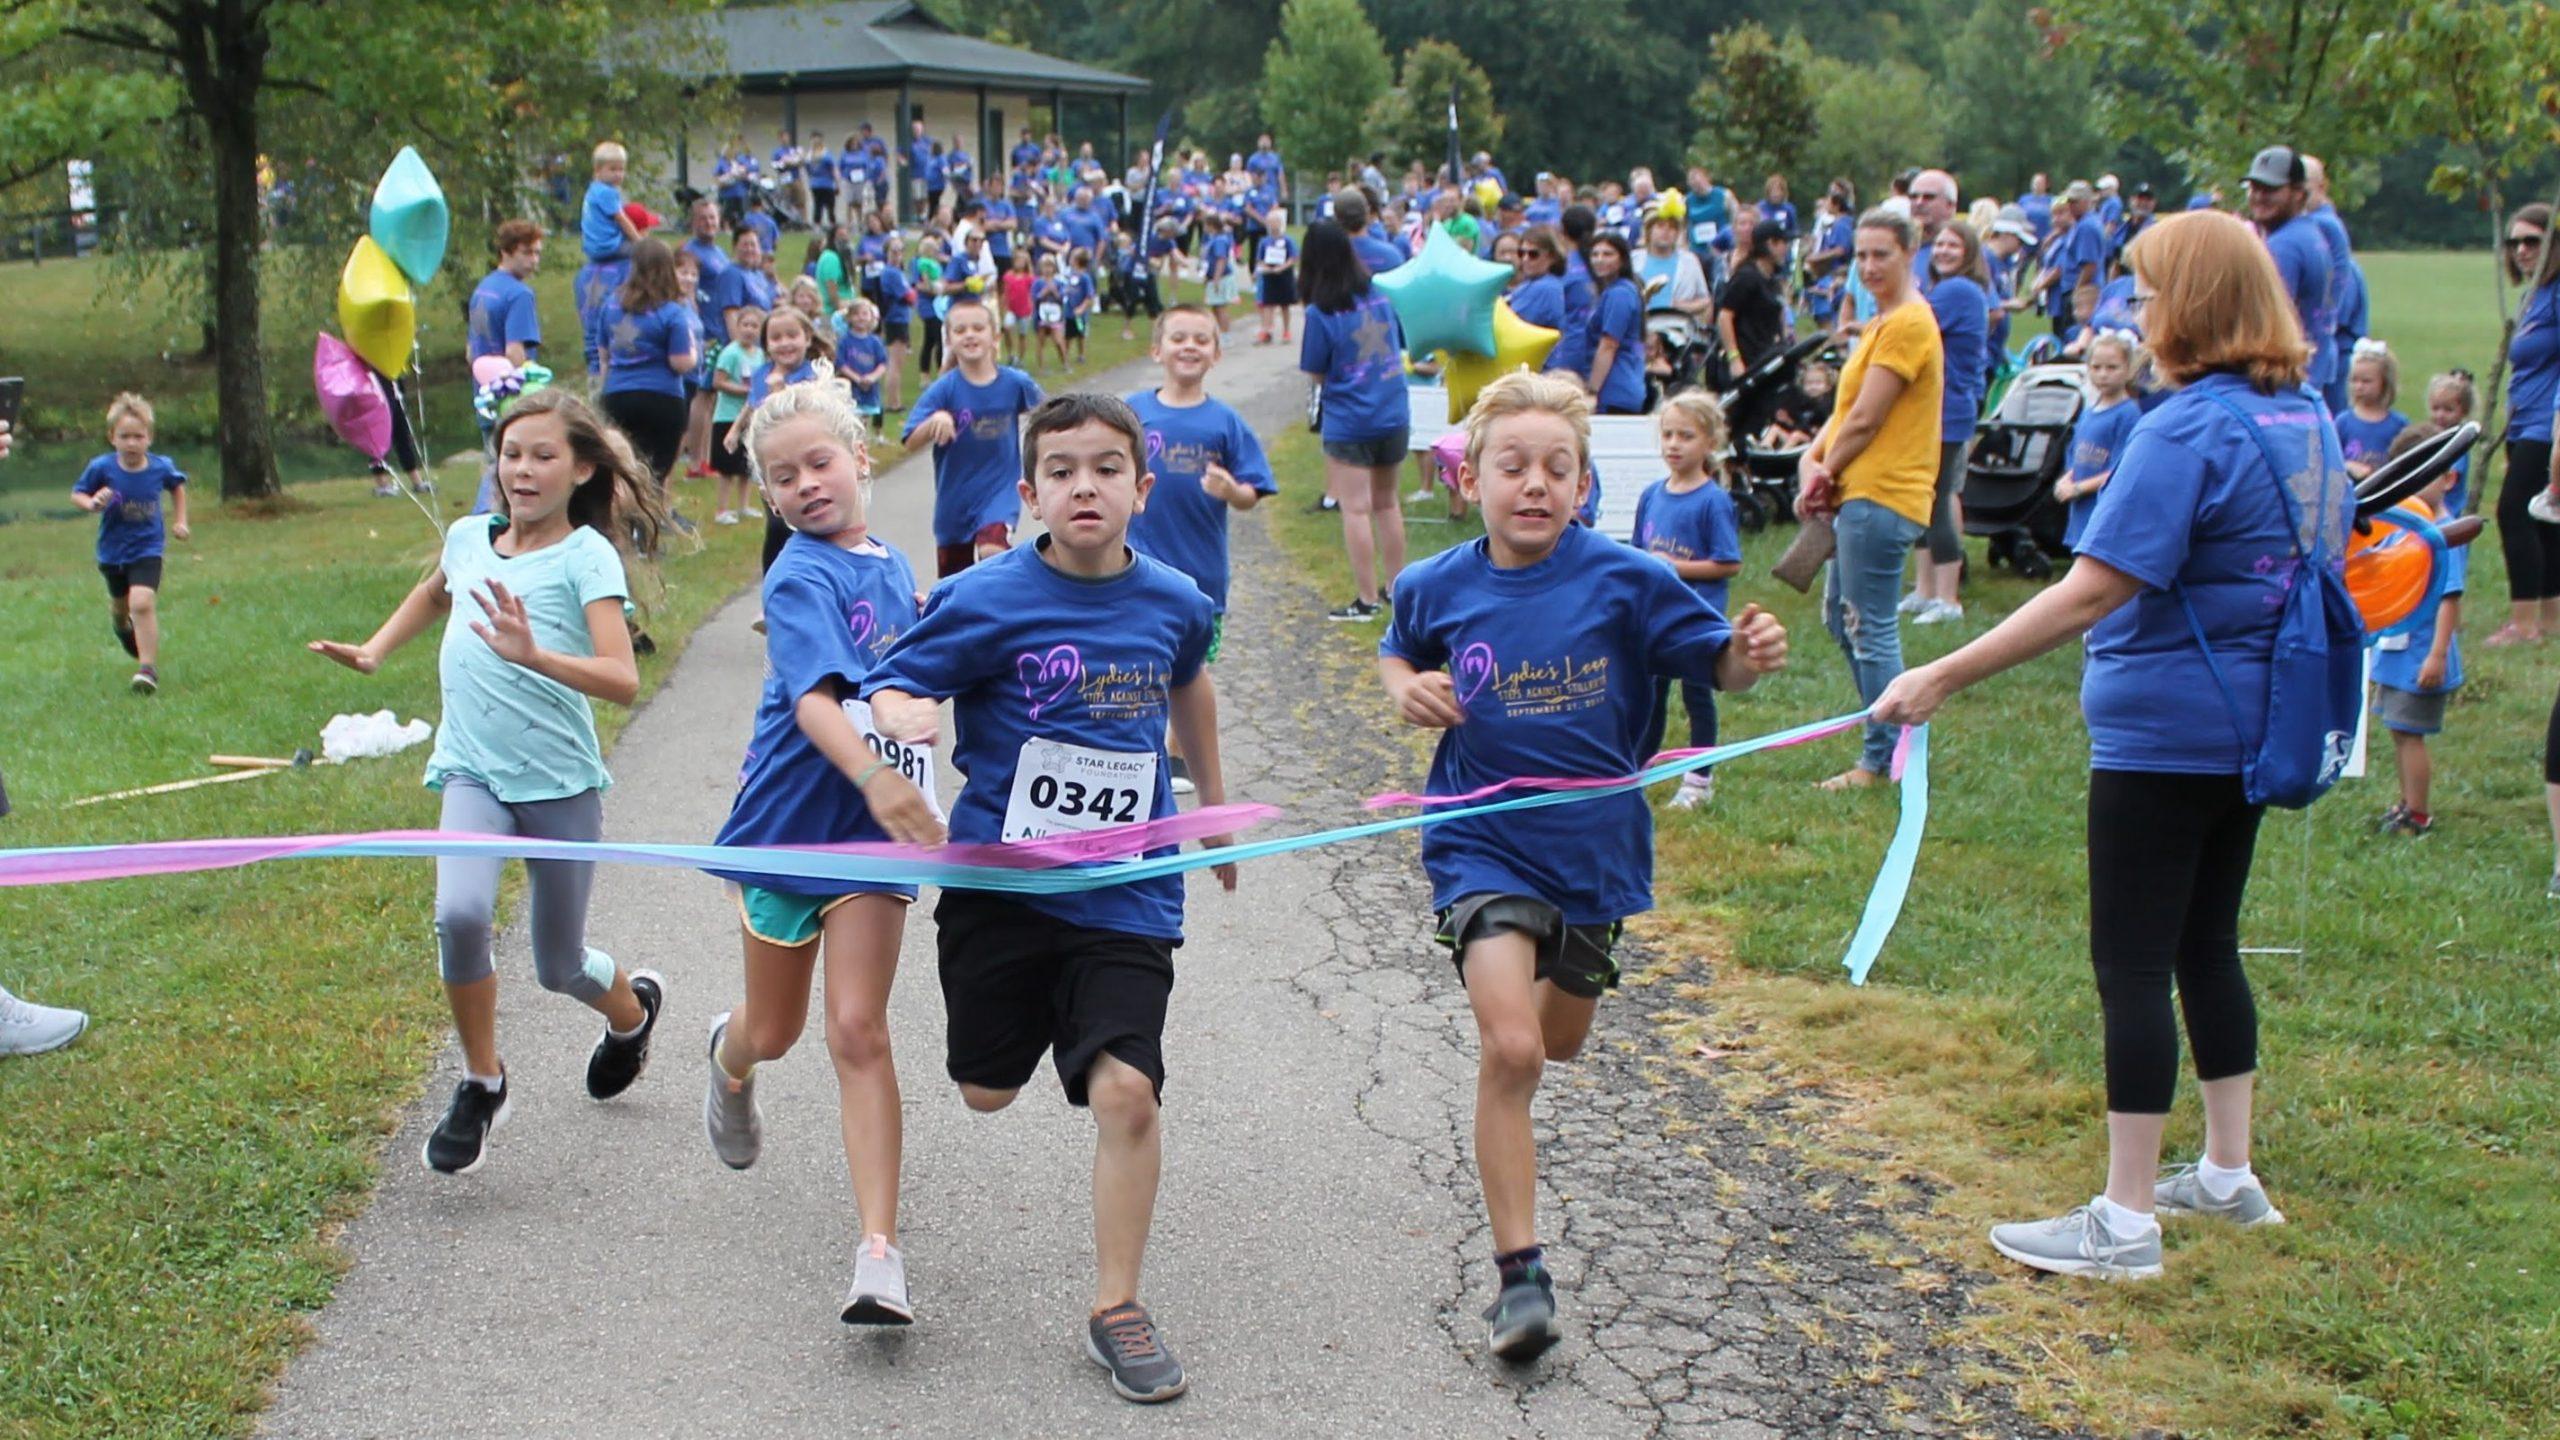 Kids cross the finish line at Lydie's Loop kids race